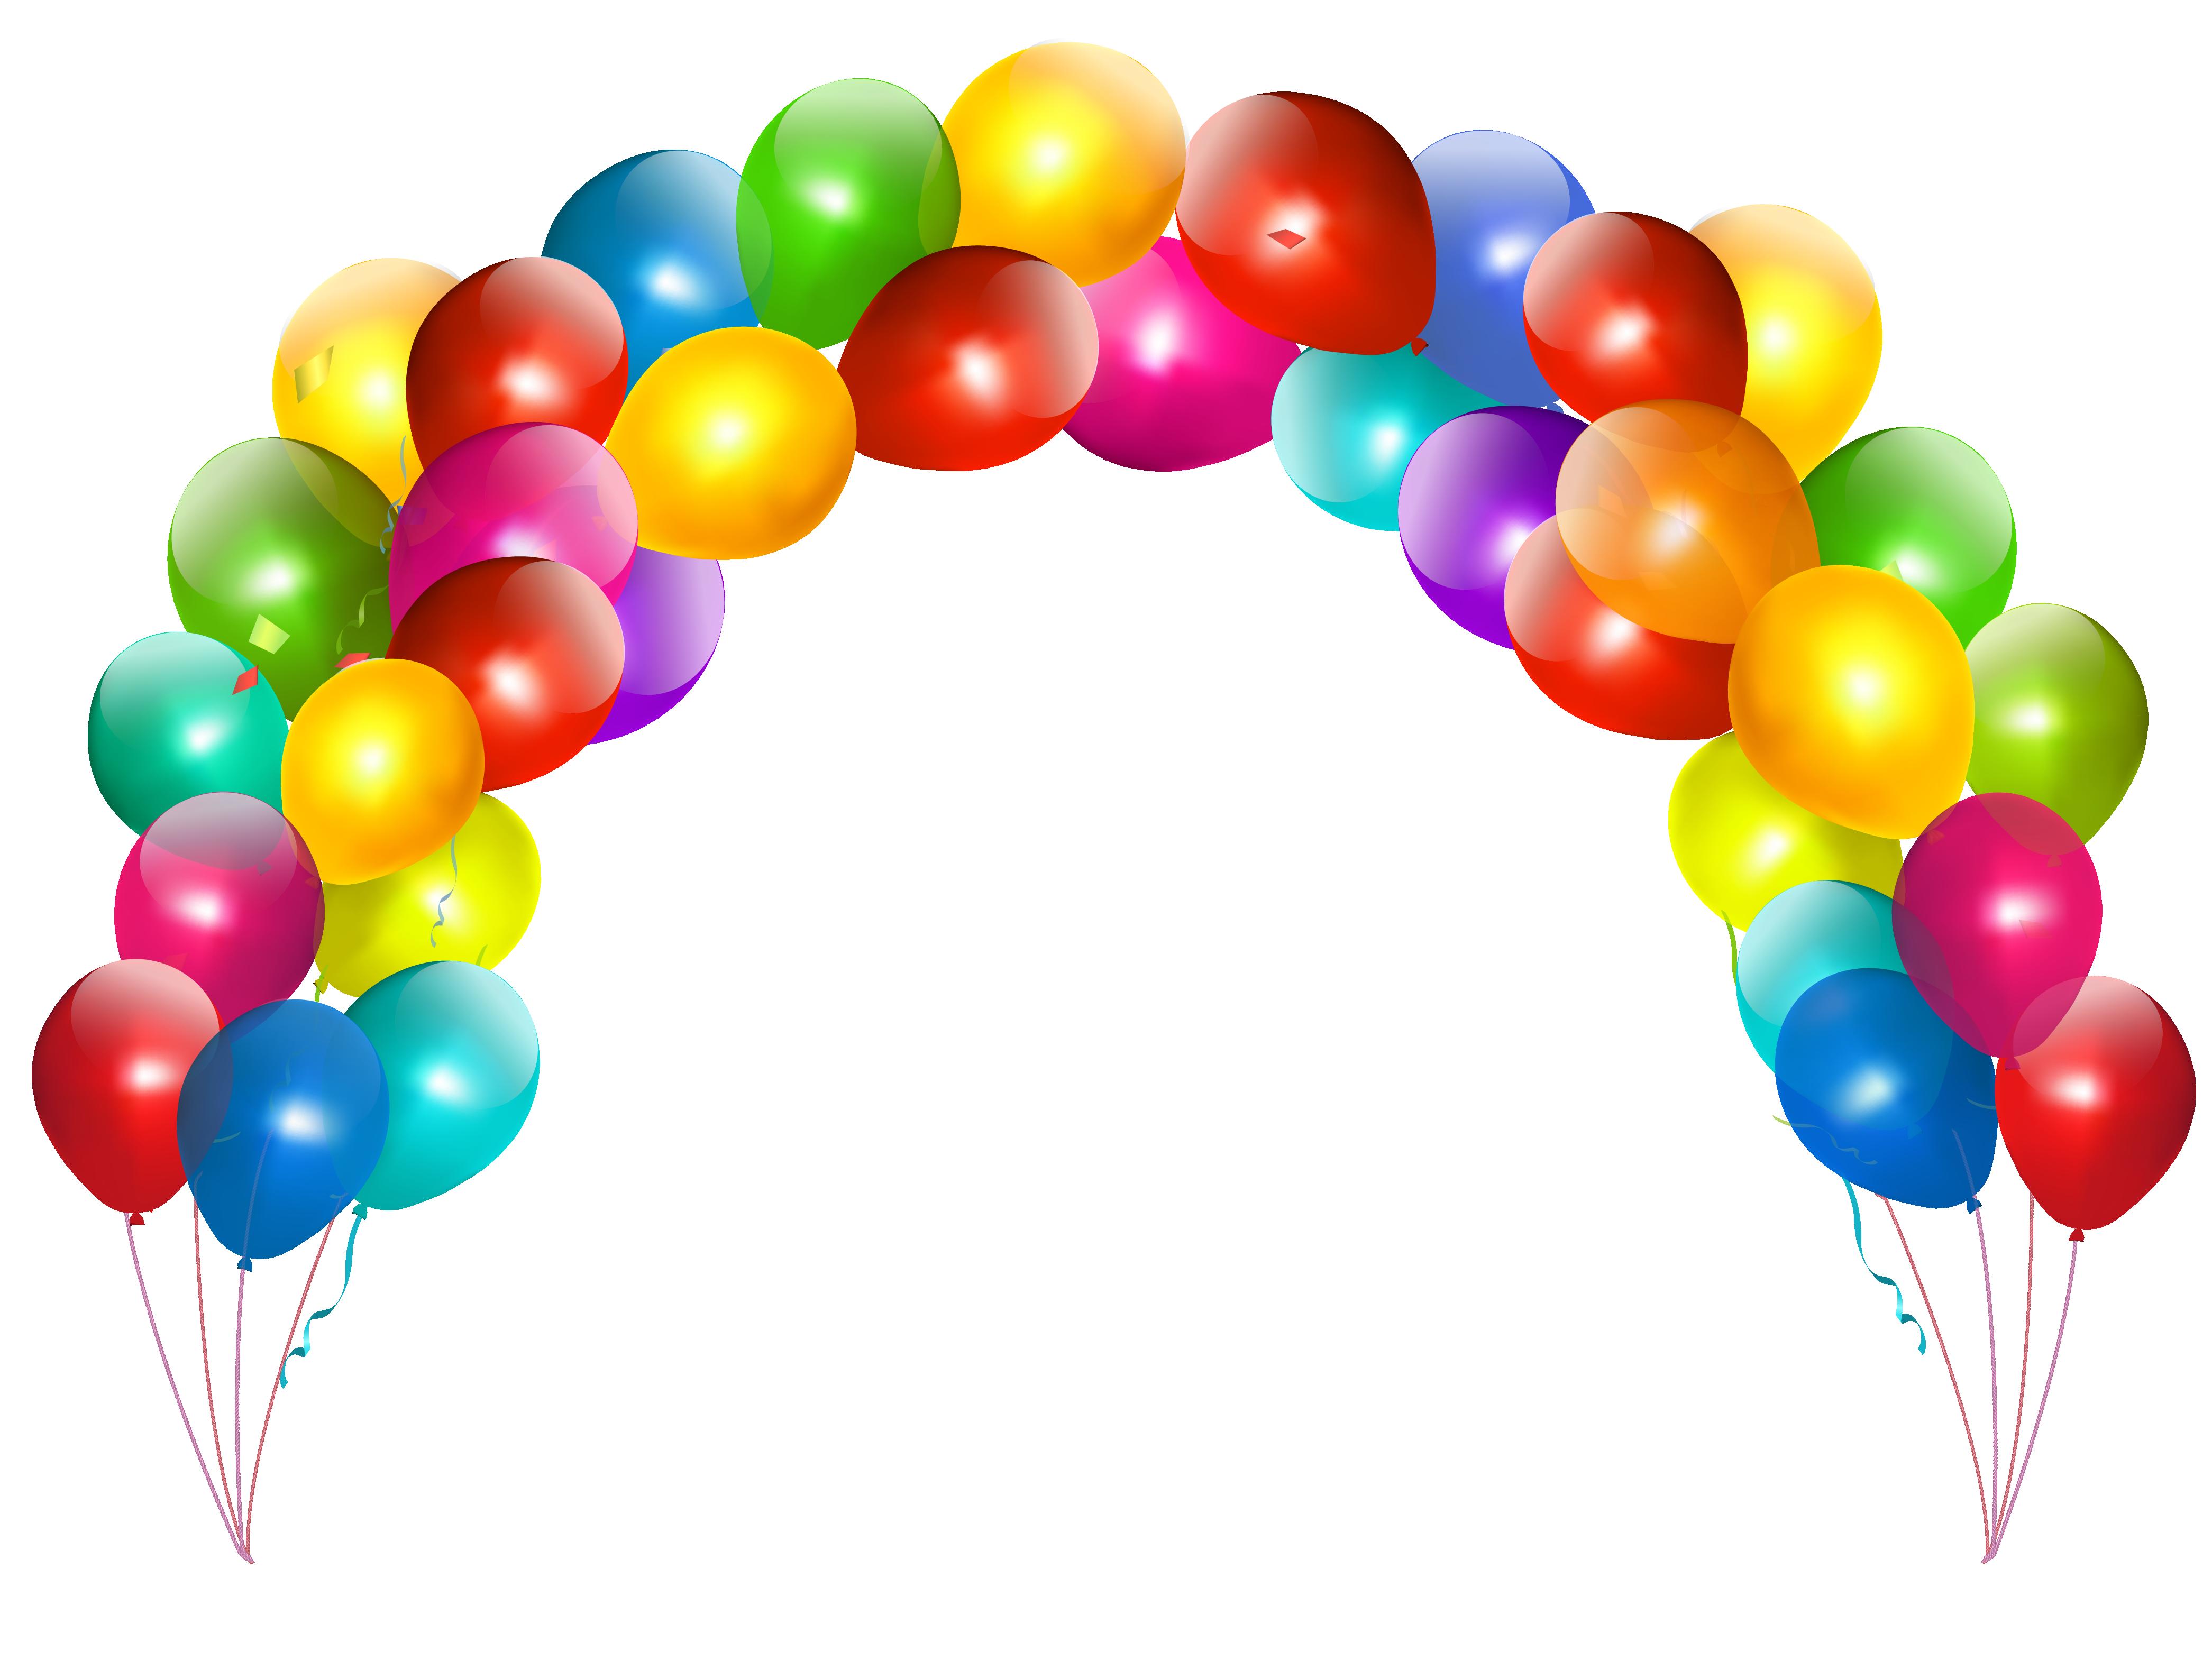 Balloon Arch Clipart.